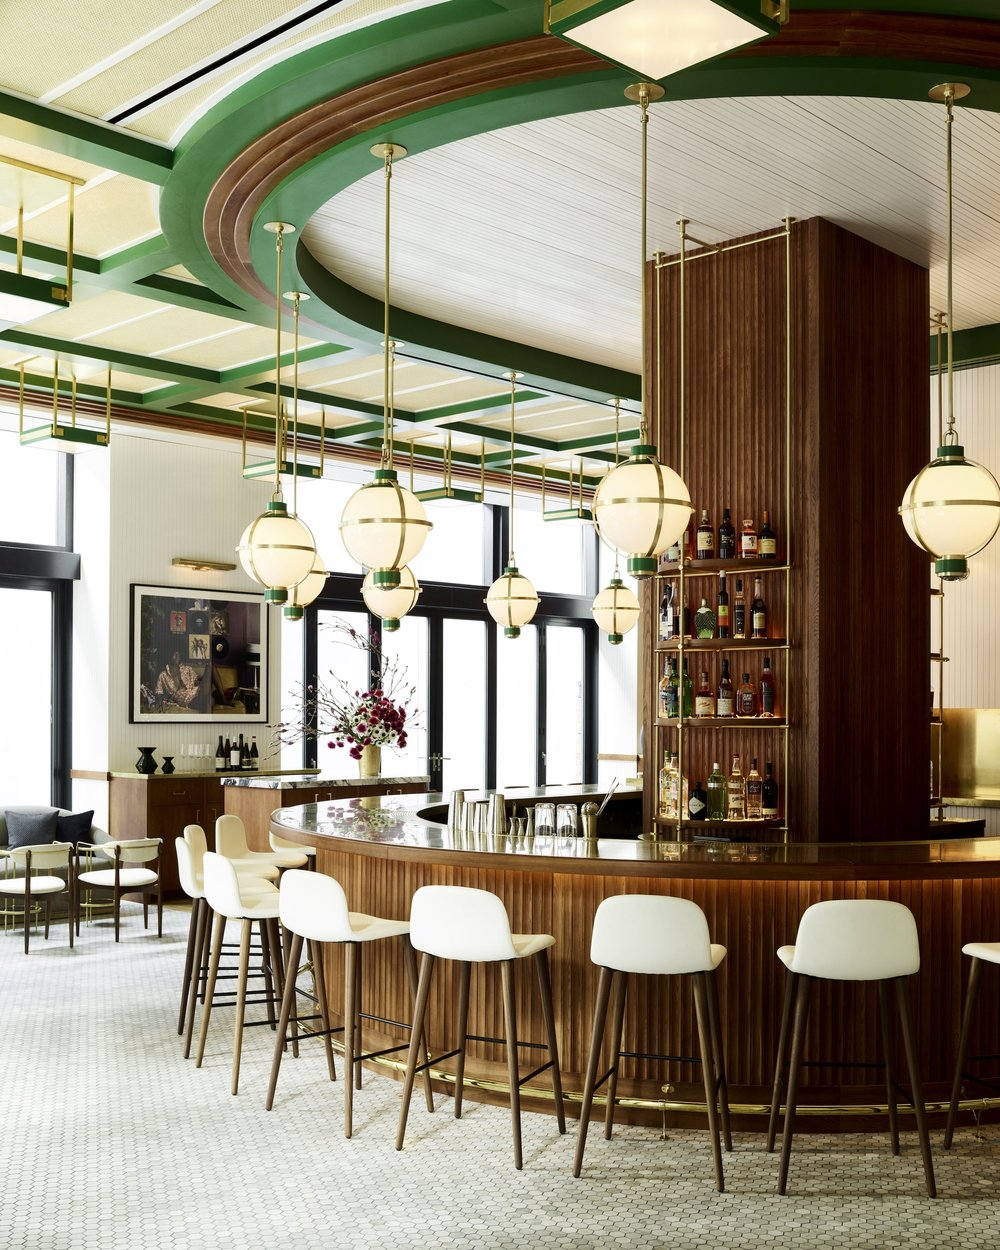 Legacy Records restaurant bar low res.jpg